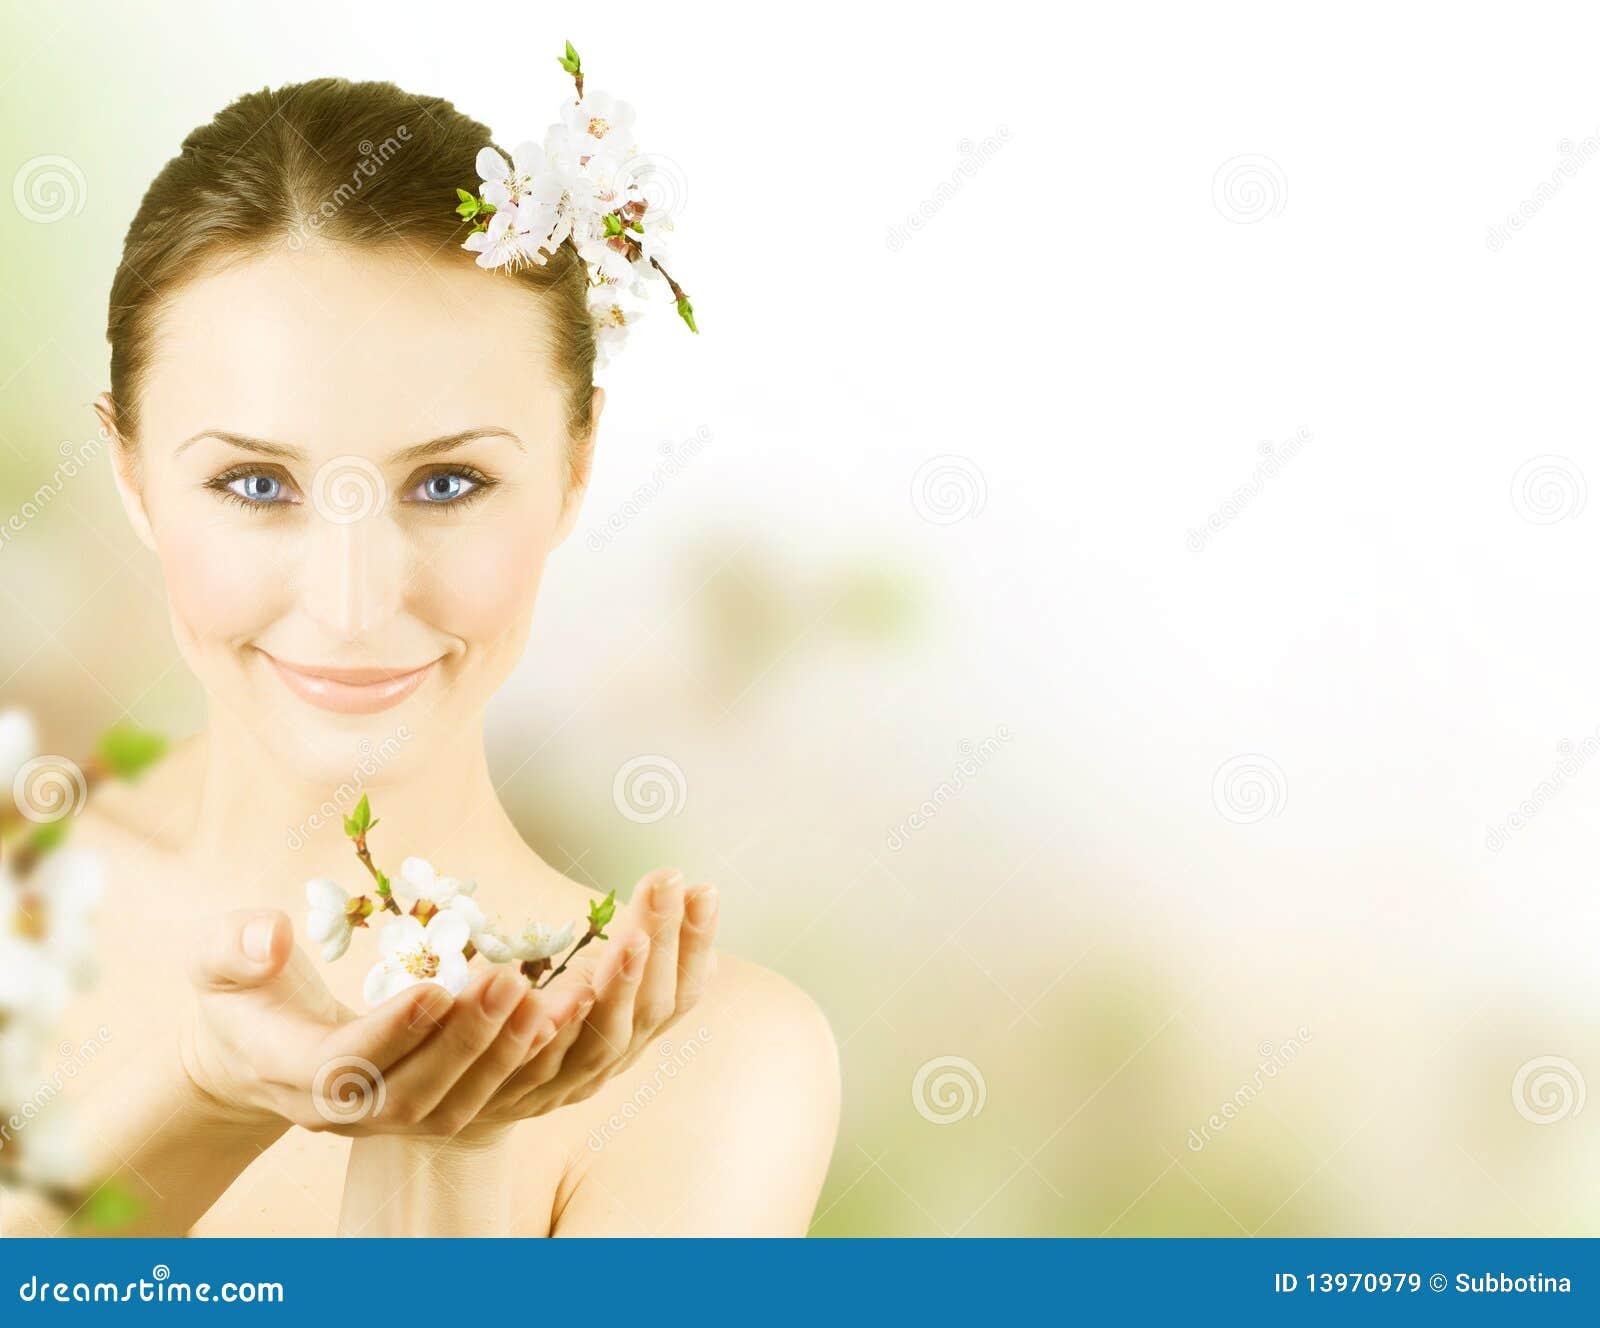 mujer flor: